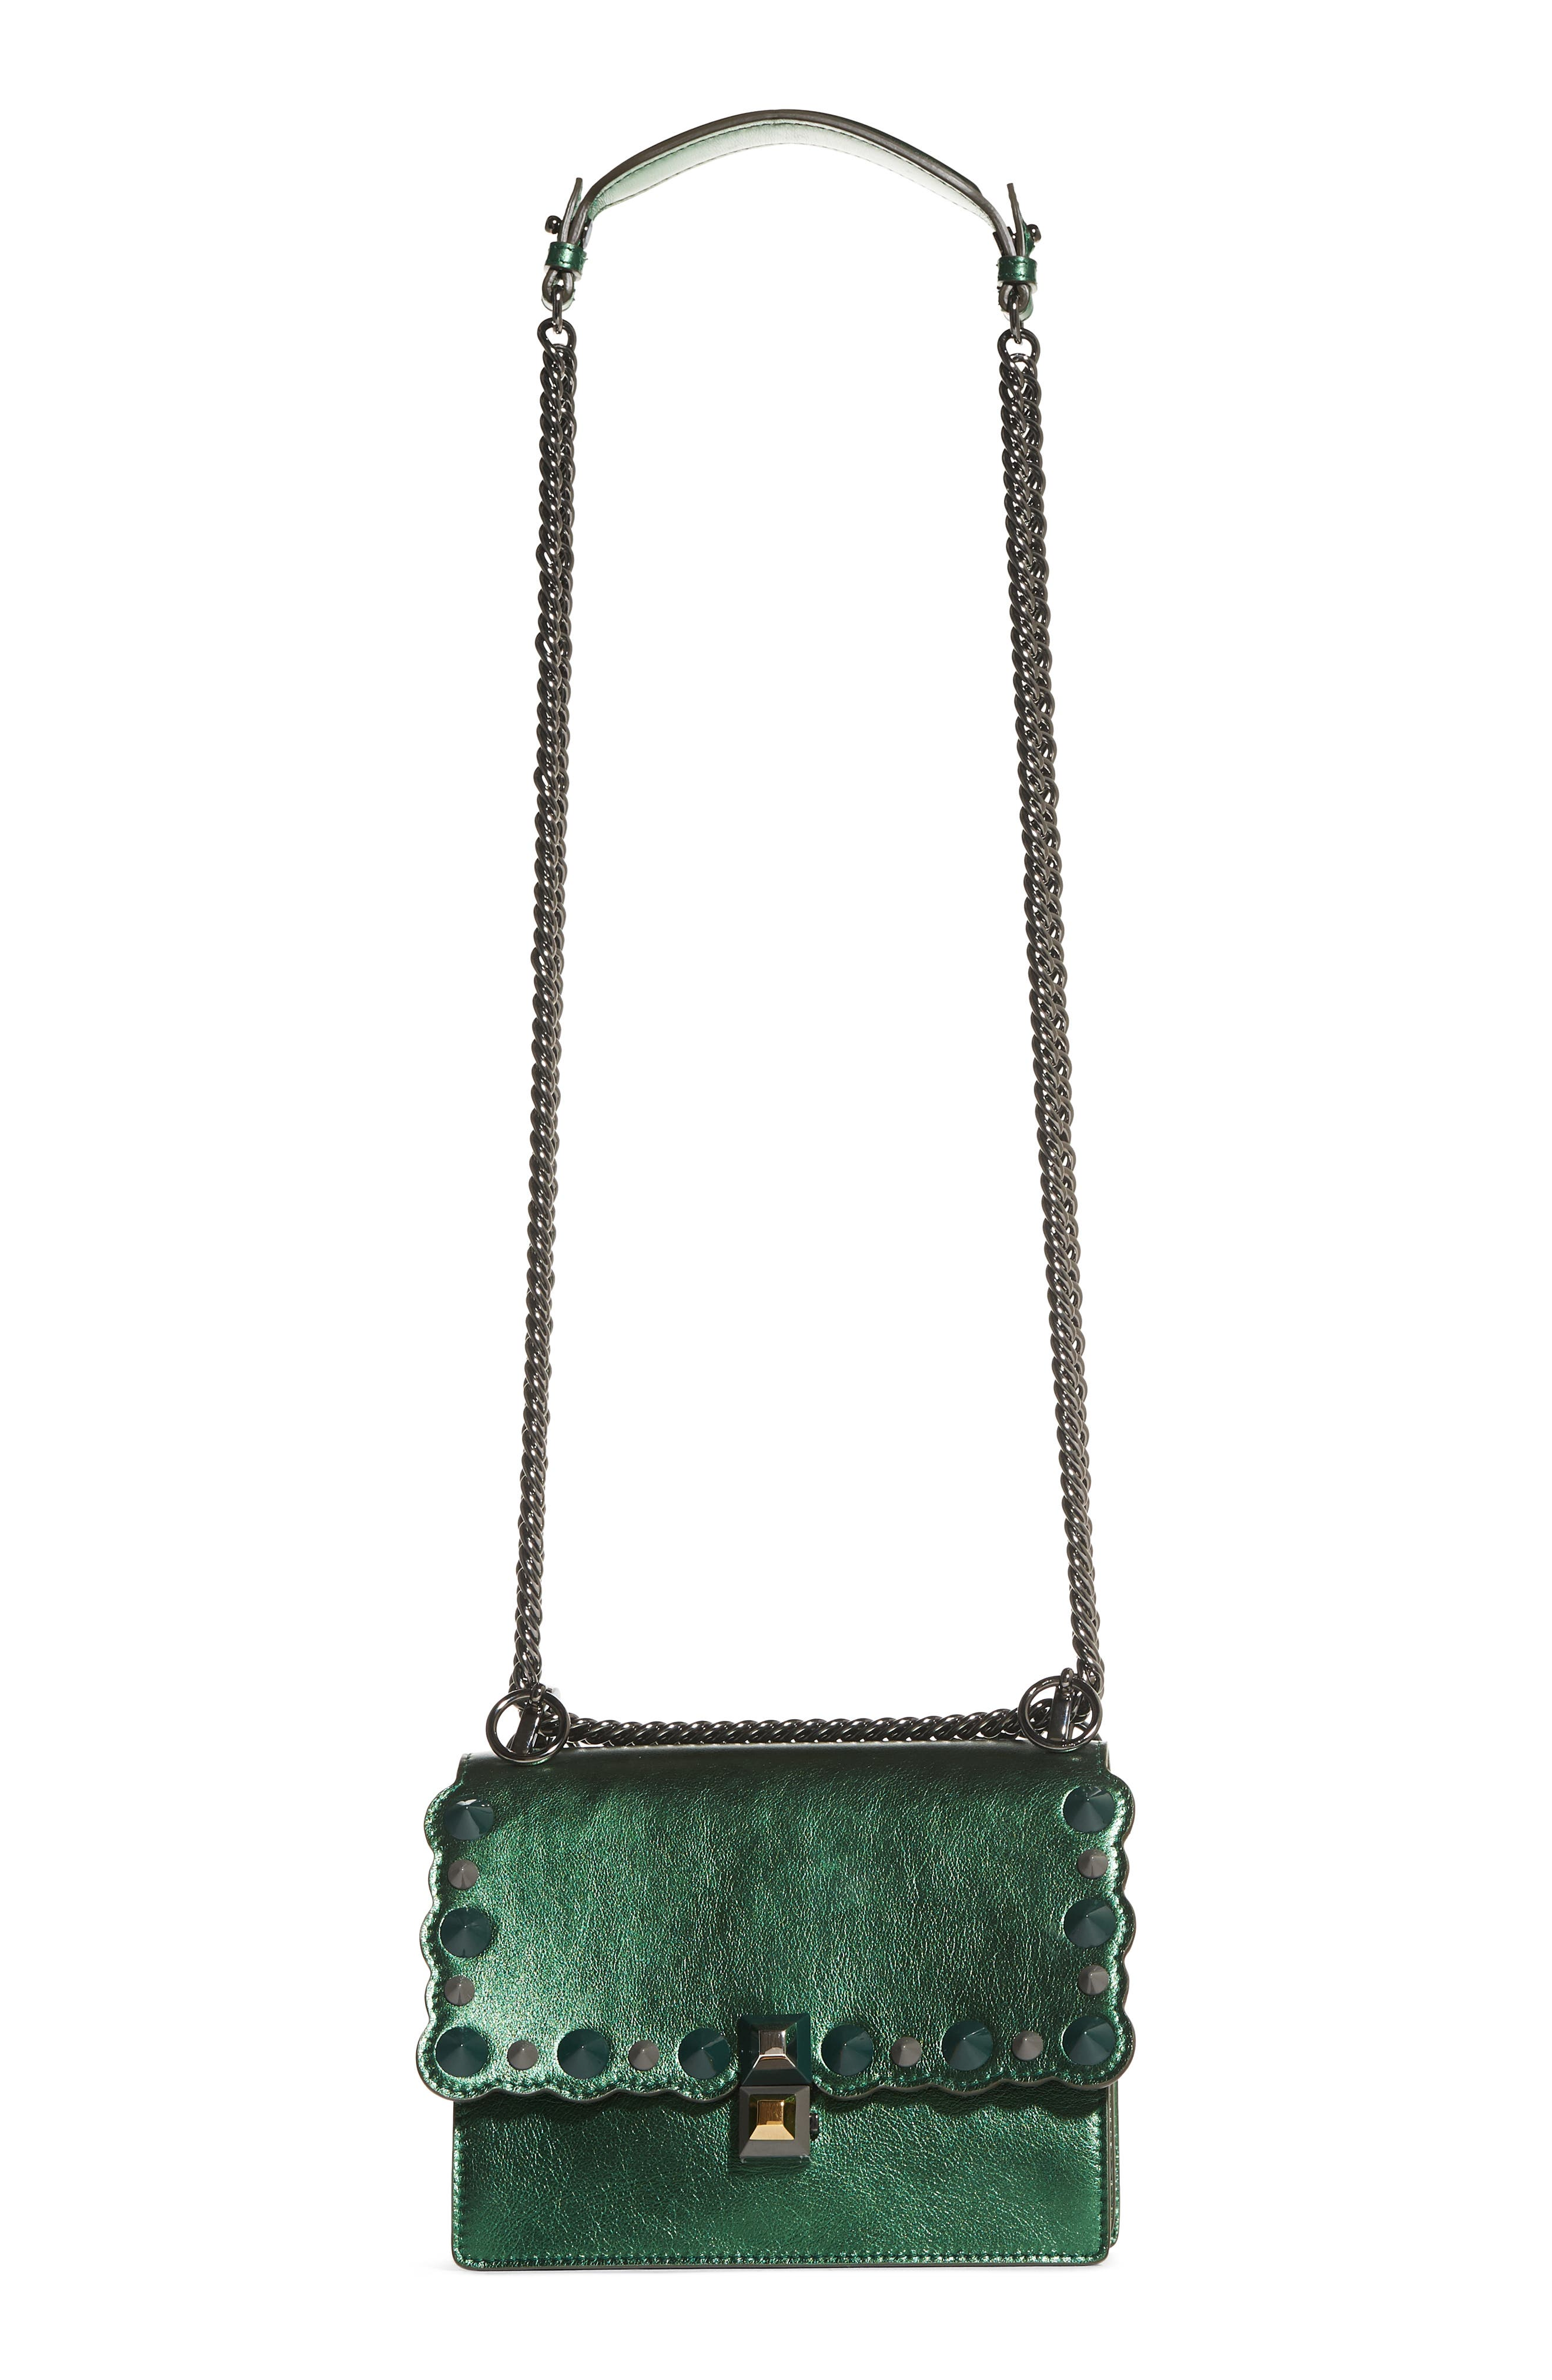 Small Kan I Metallic Leather Shoulder Bag,                             Main thumbnail 1, color,                             GREEN METALLIC